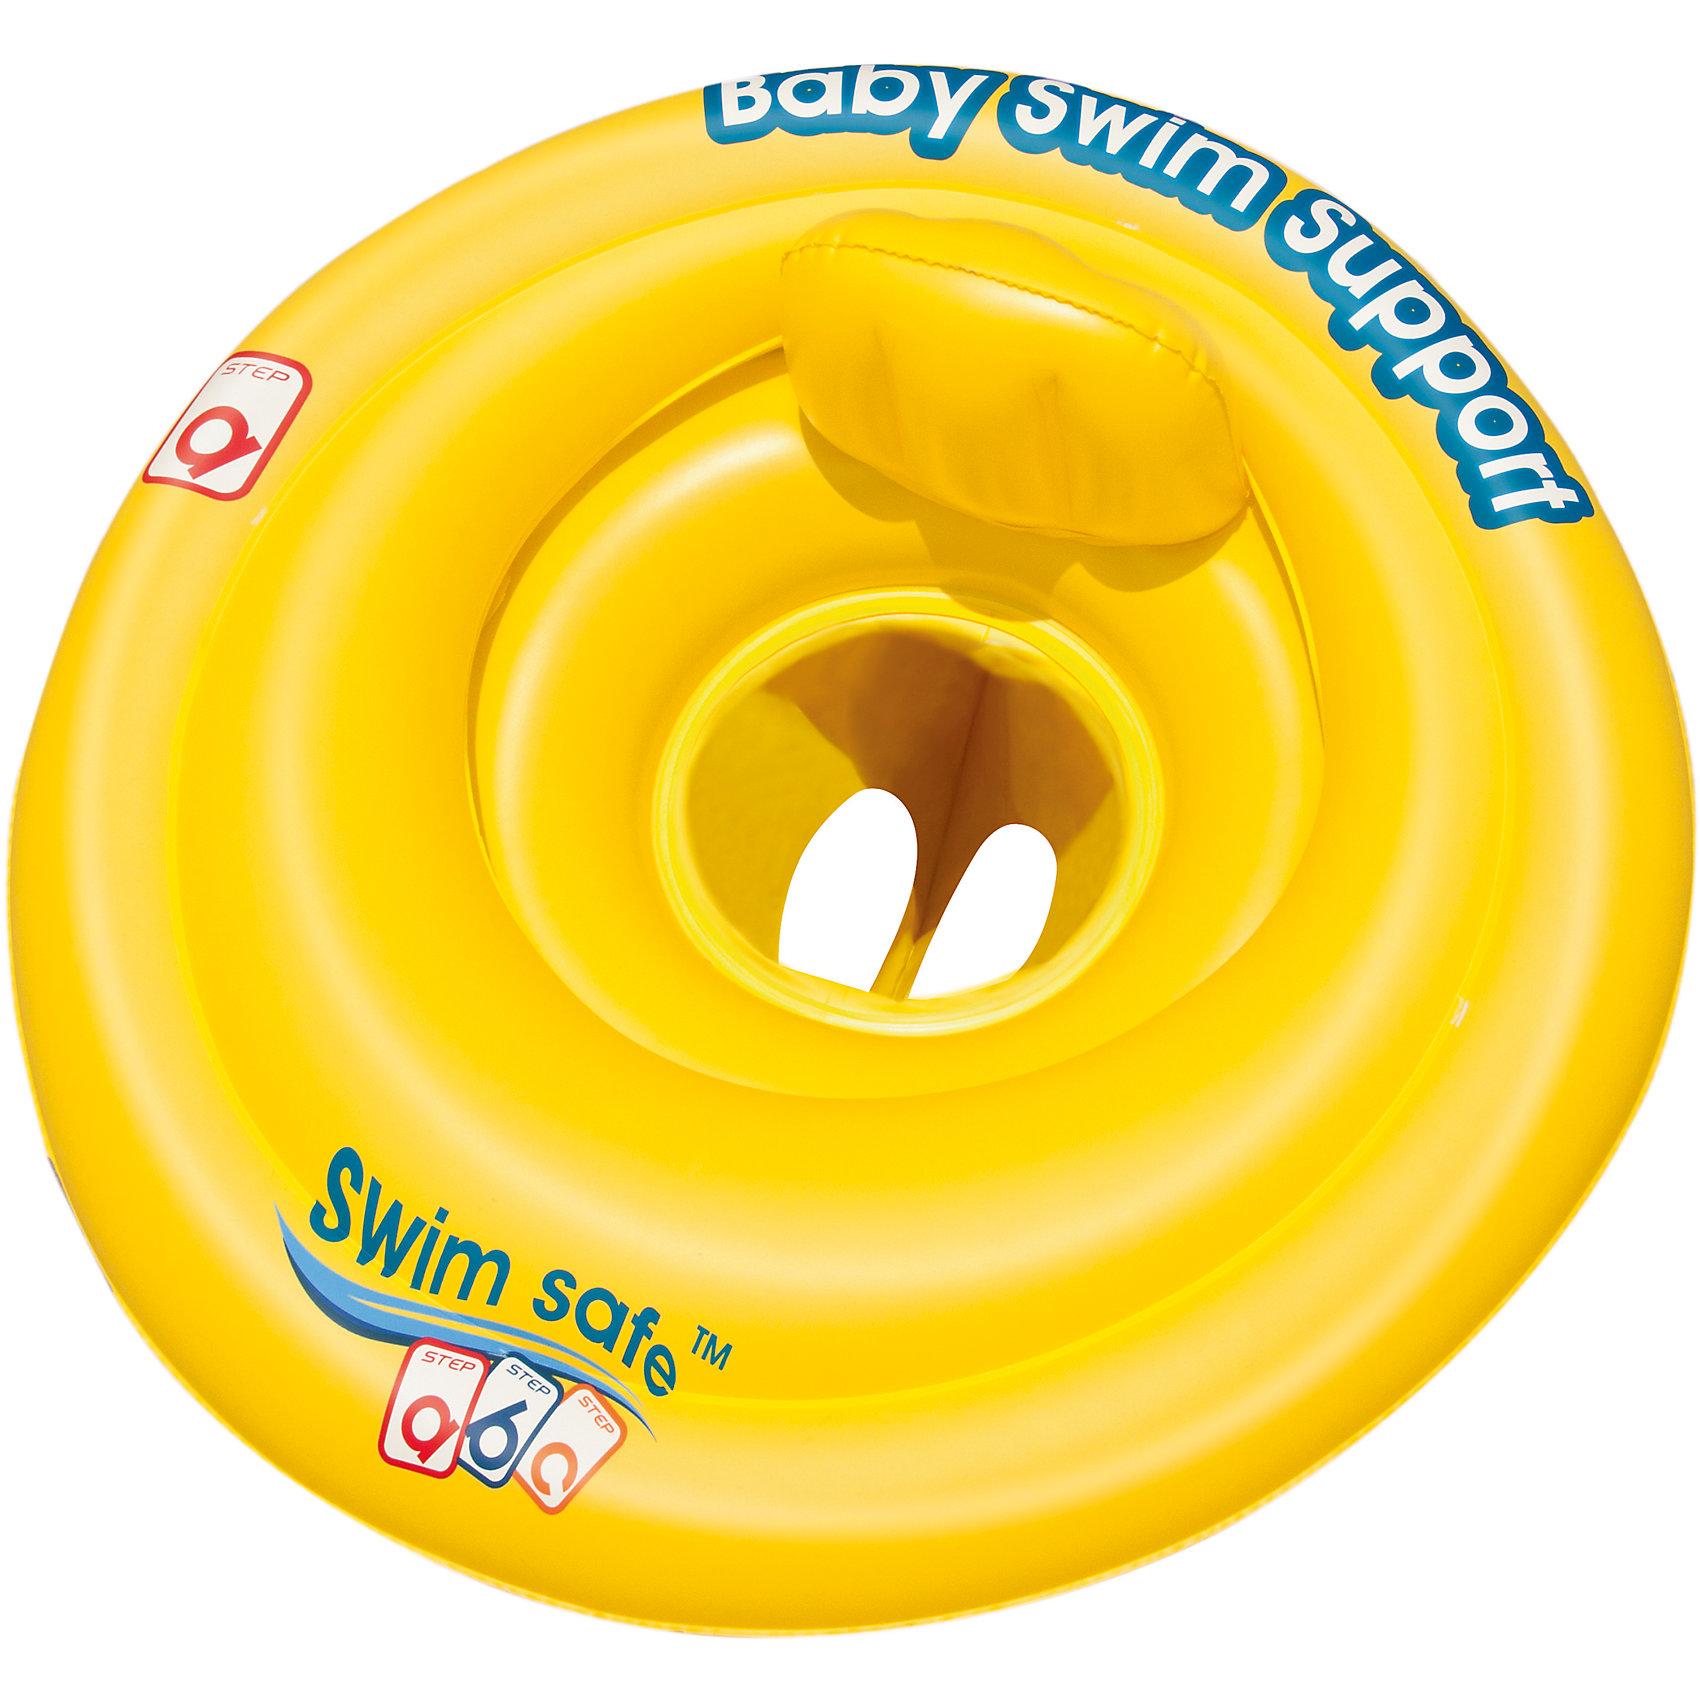 ���� ��� �������� � �������� � ������� Swim Safe, ������� A,  Bestway